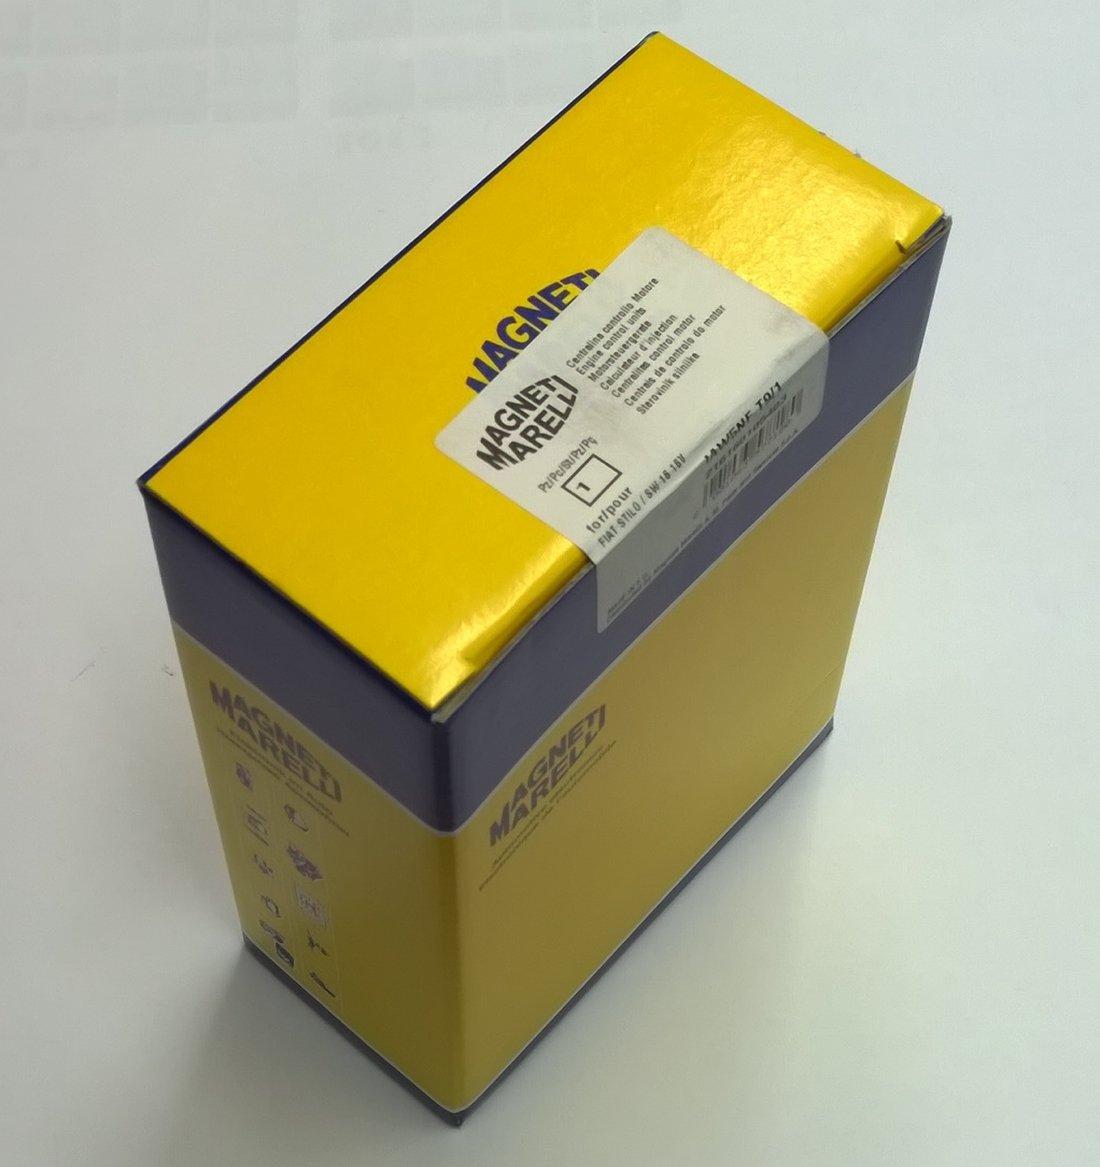 Magneti Marelli 216160037607 Appareil de commande gestion moteur